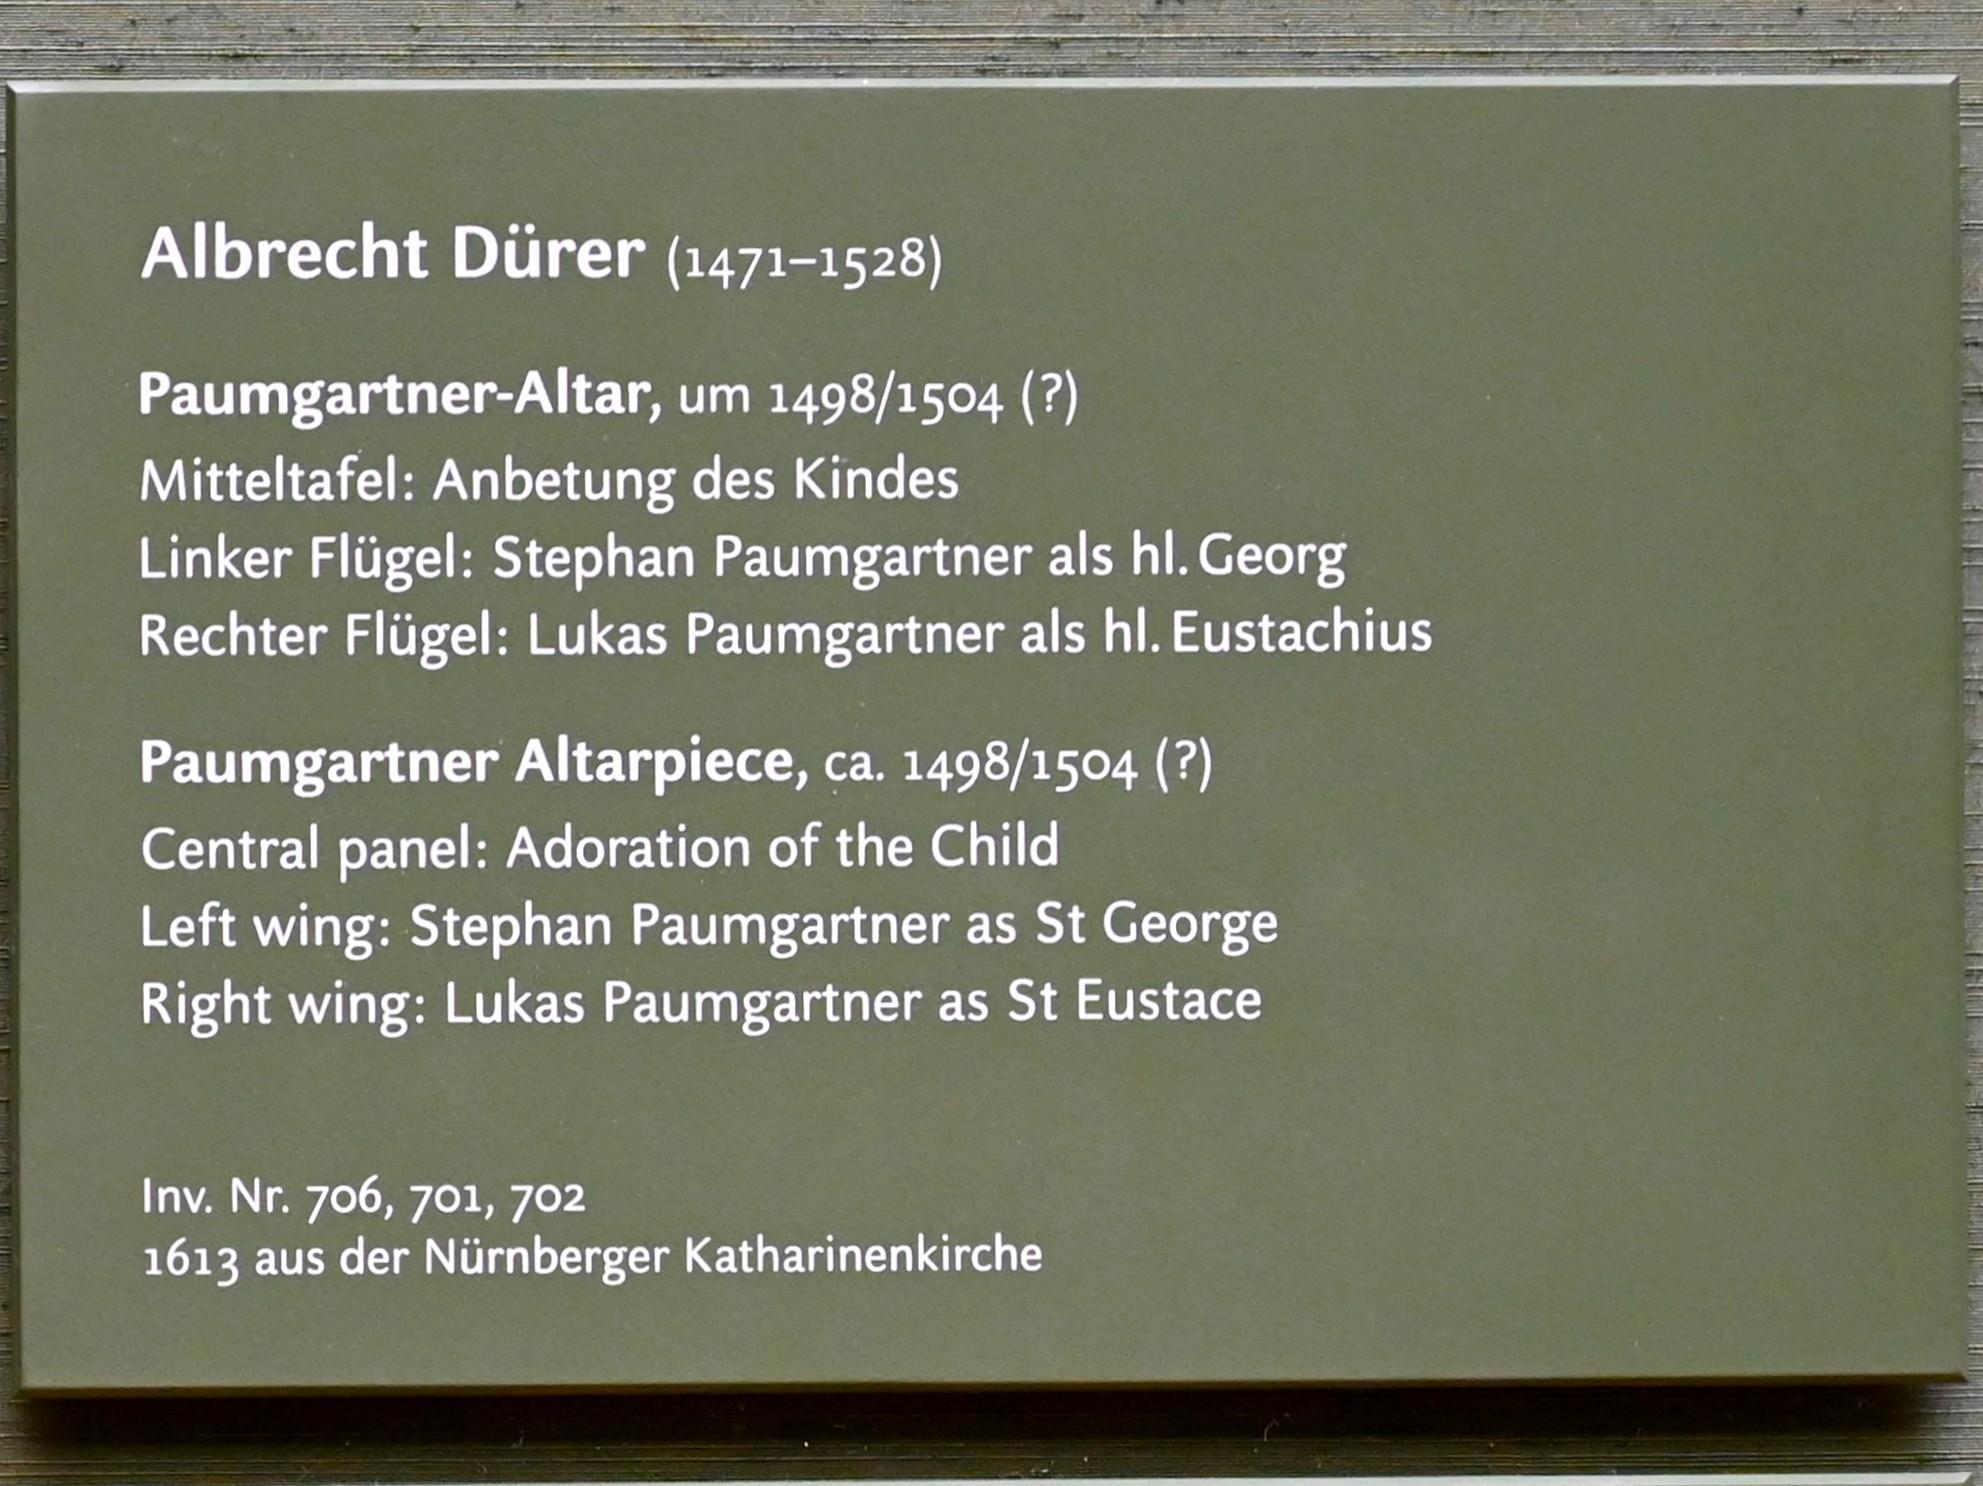 Albrecht Dürer: Paumgartner-Altar, um 1498 - 1504, Bild 2/2